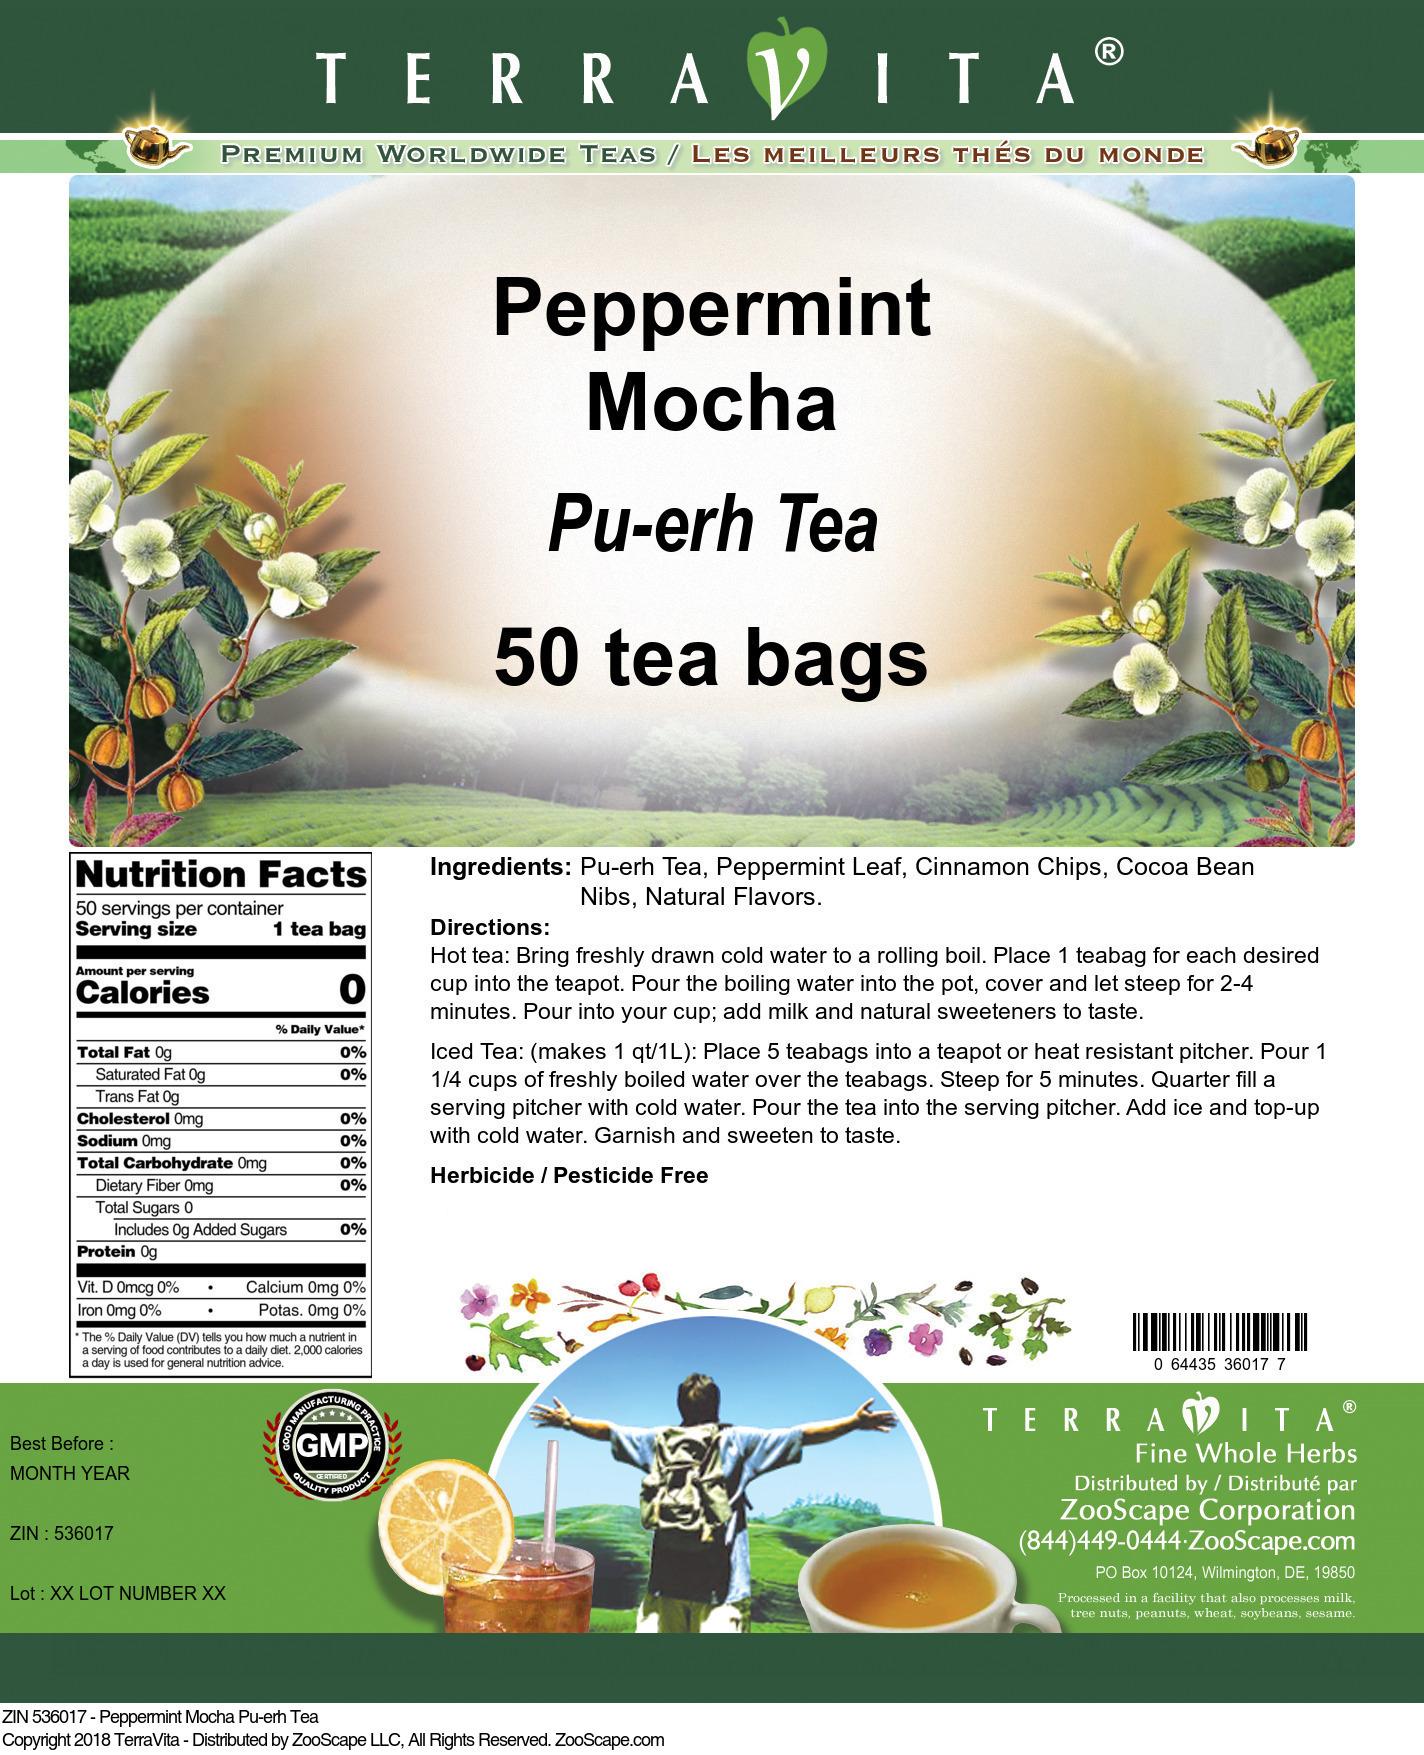 Peppermint Mocha Pu-erh Tea